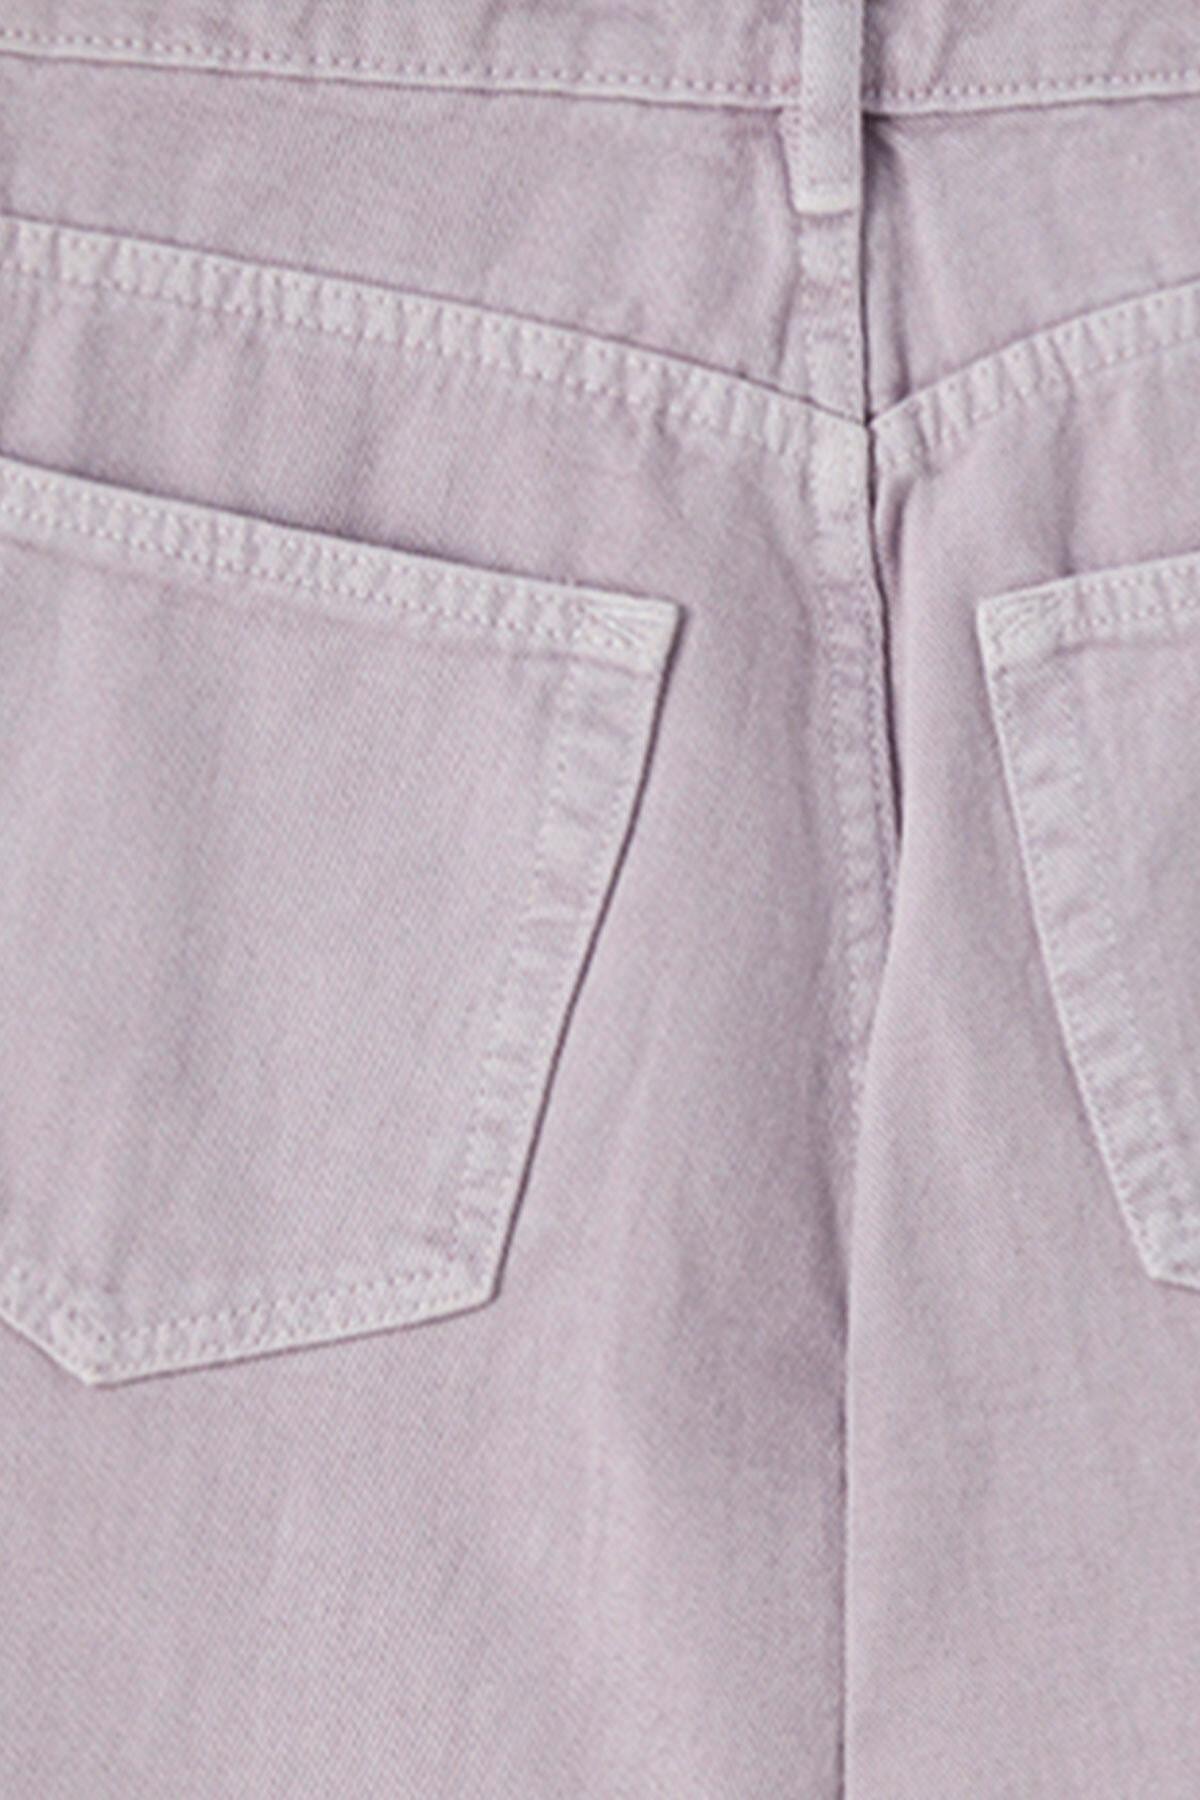 Pull & Bear Kadın Leylak Crop Straight Fit Jean 05670330 2